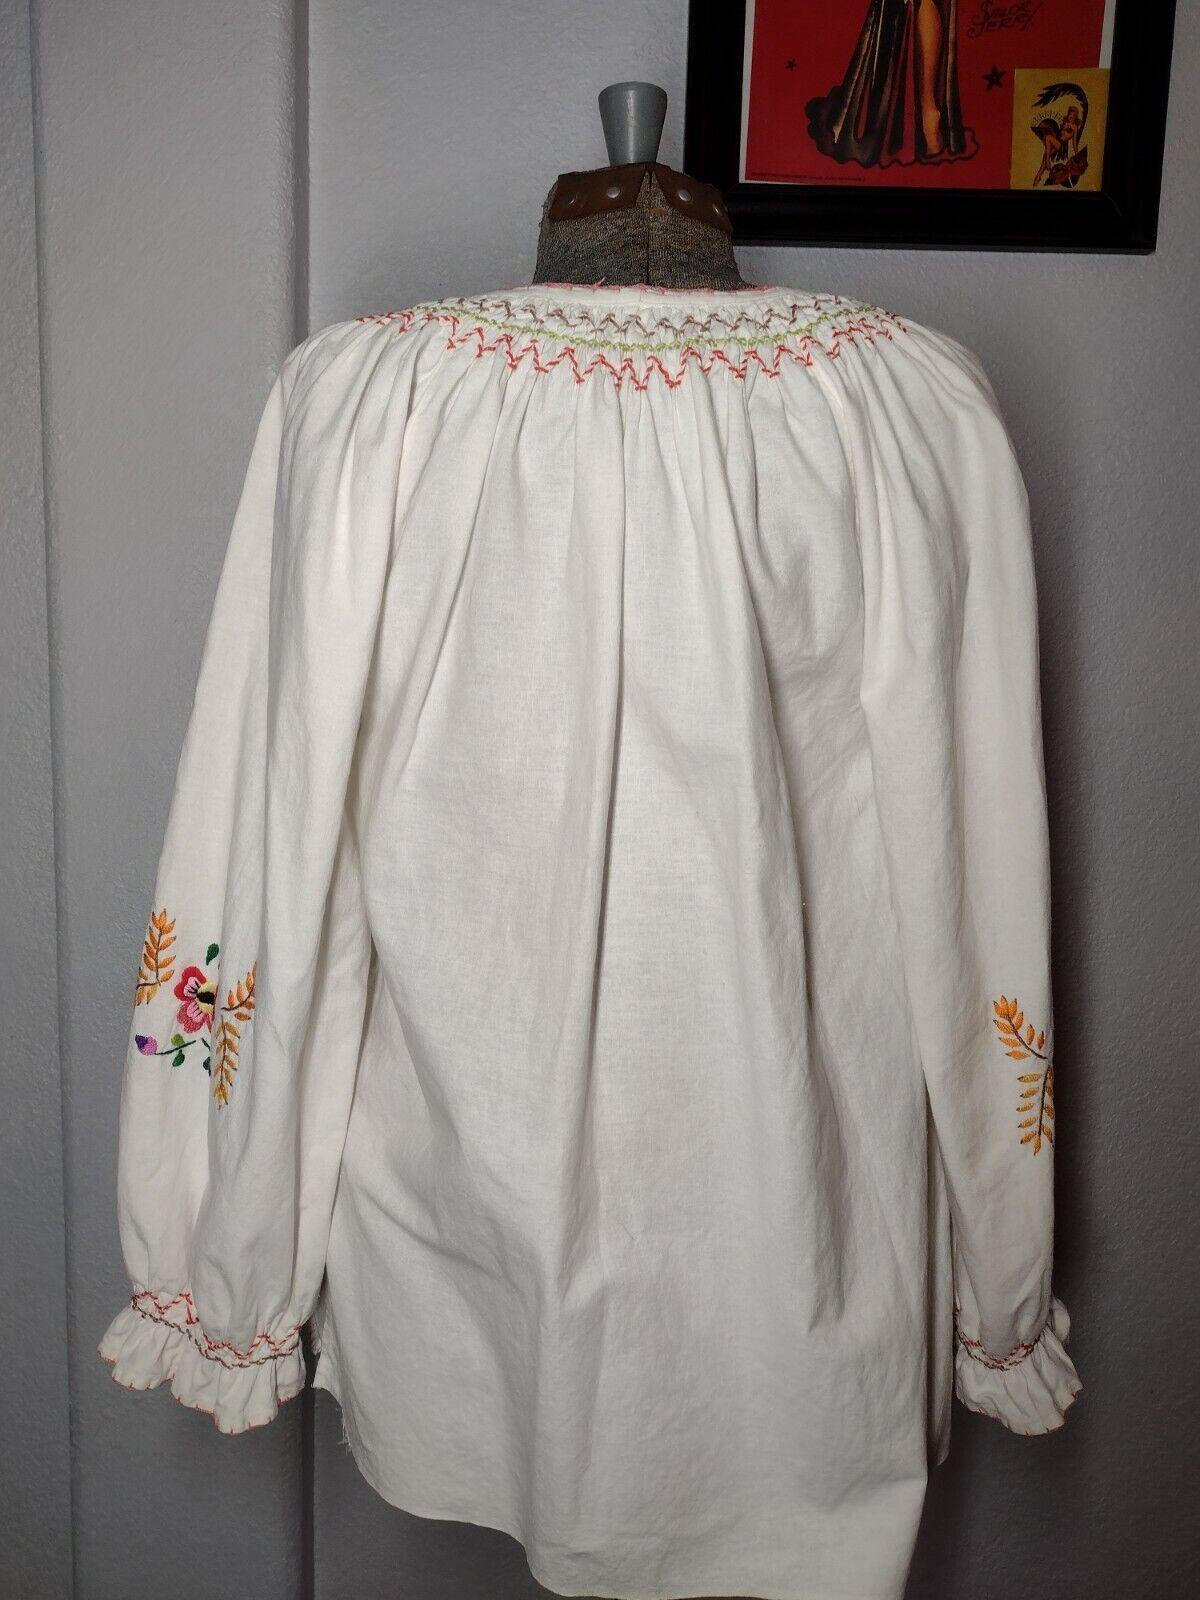 vintage hungarian blouse - image 3